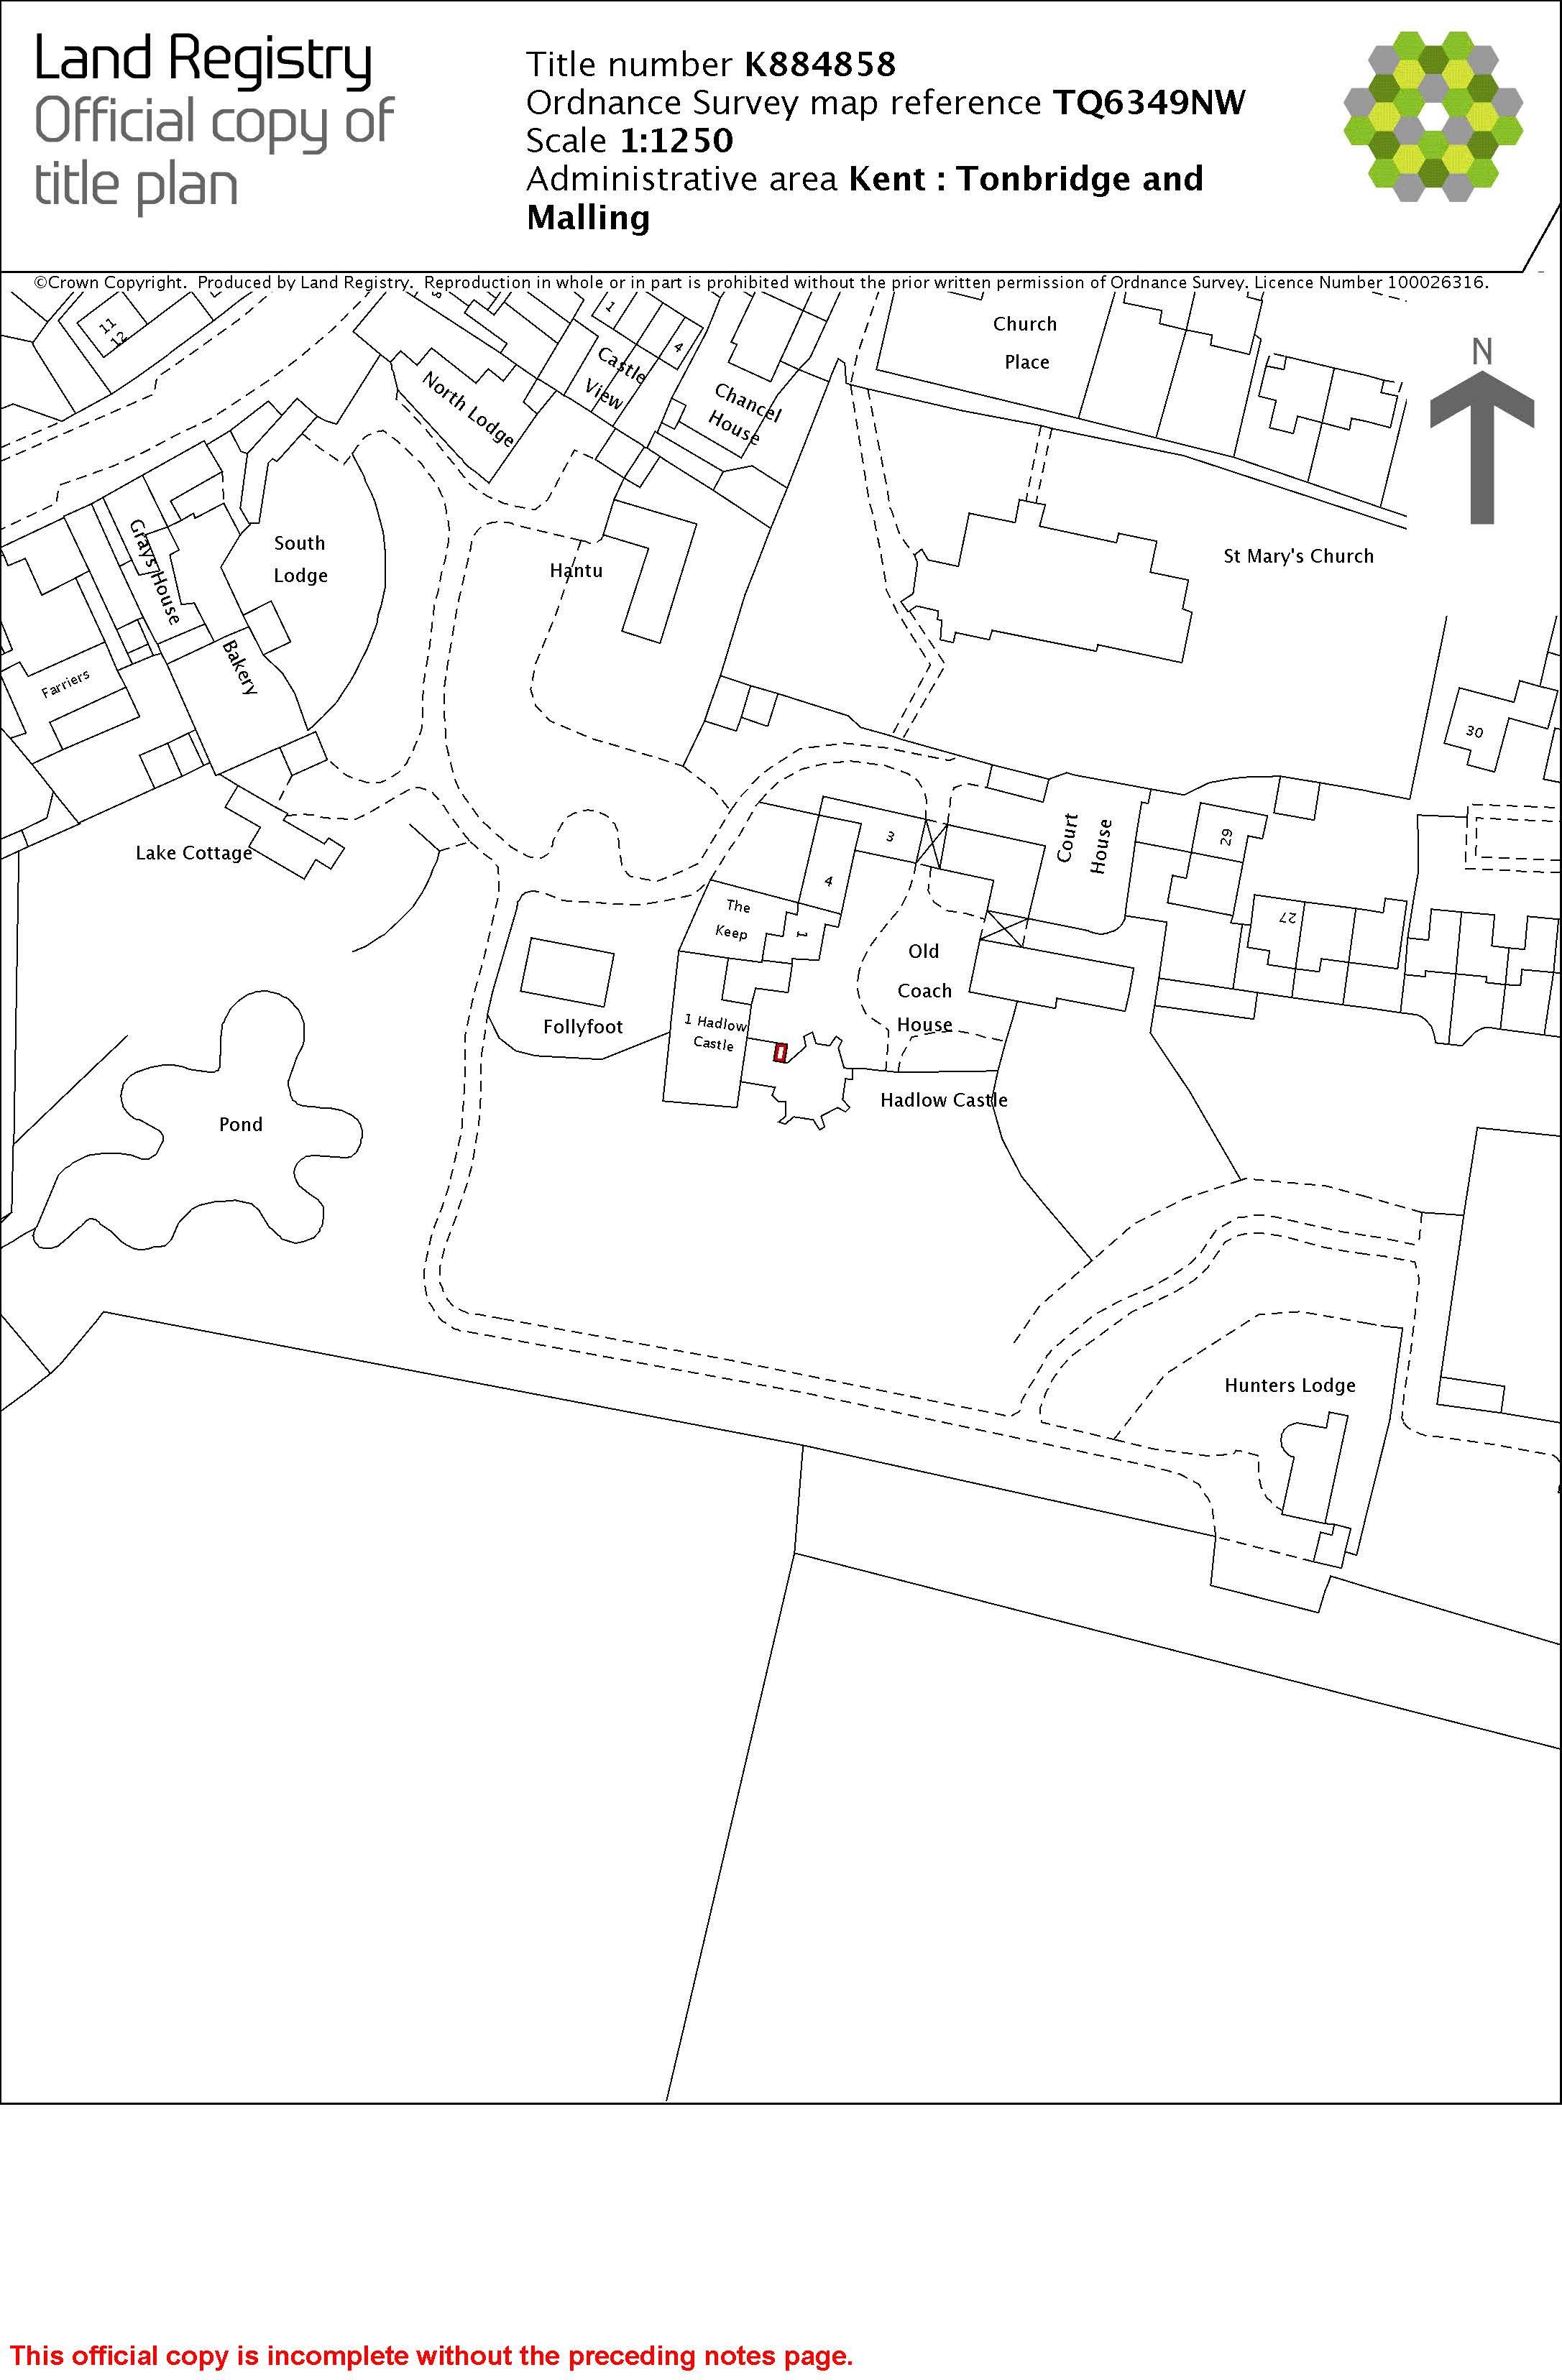 Title Plan - K884858_Page_2.jpg